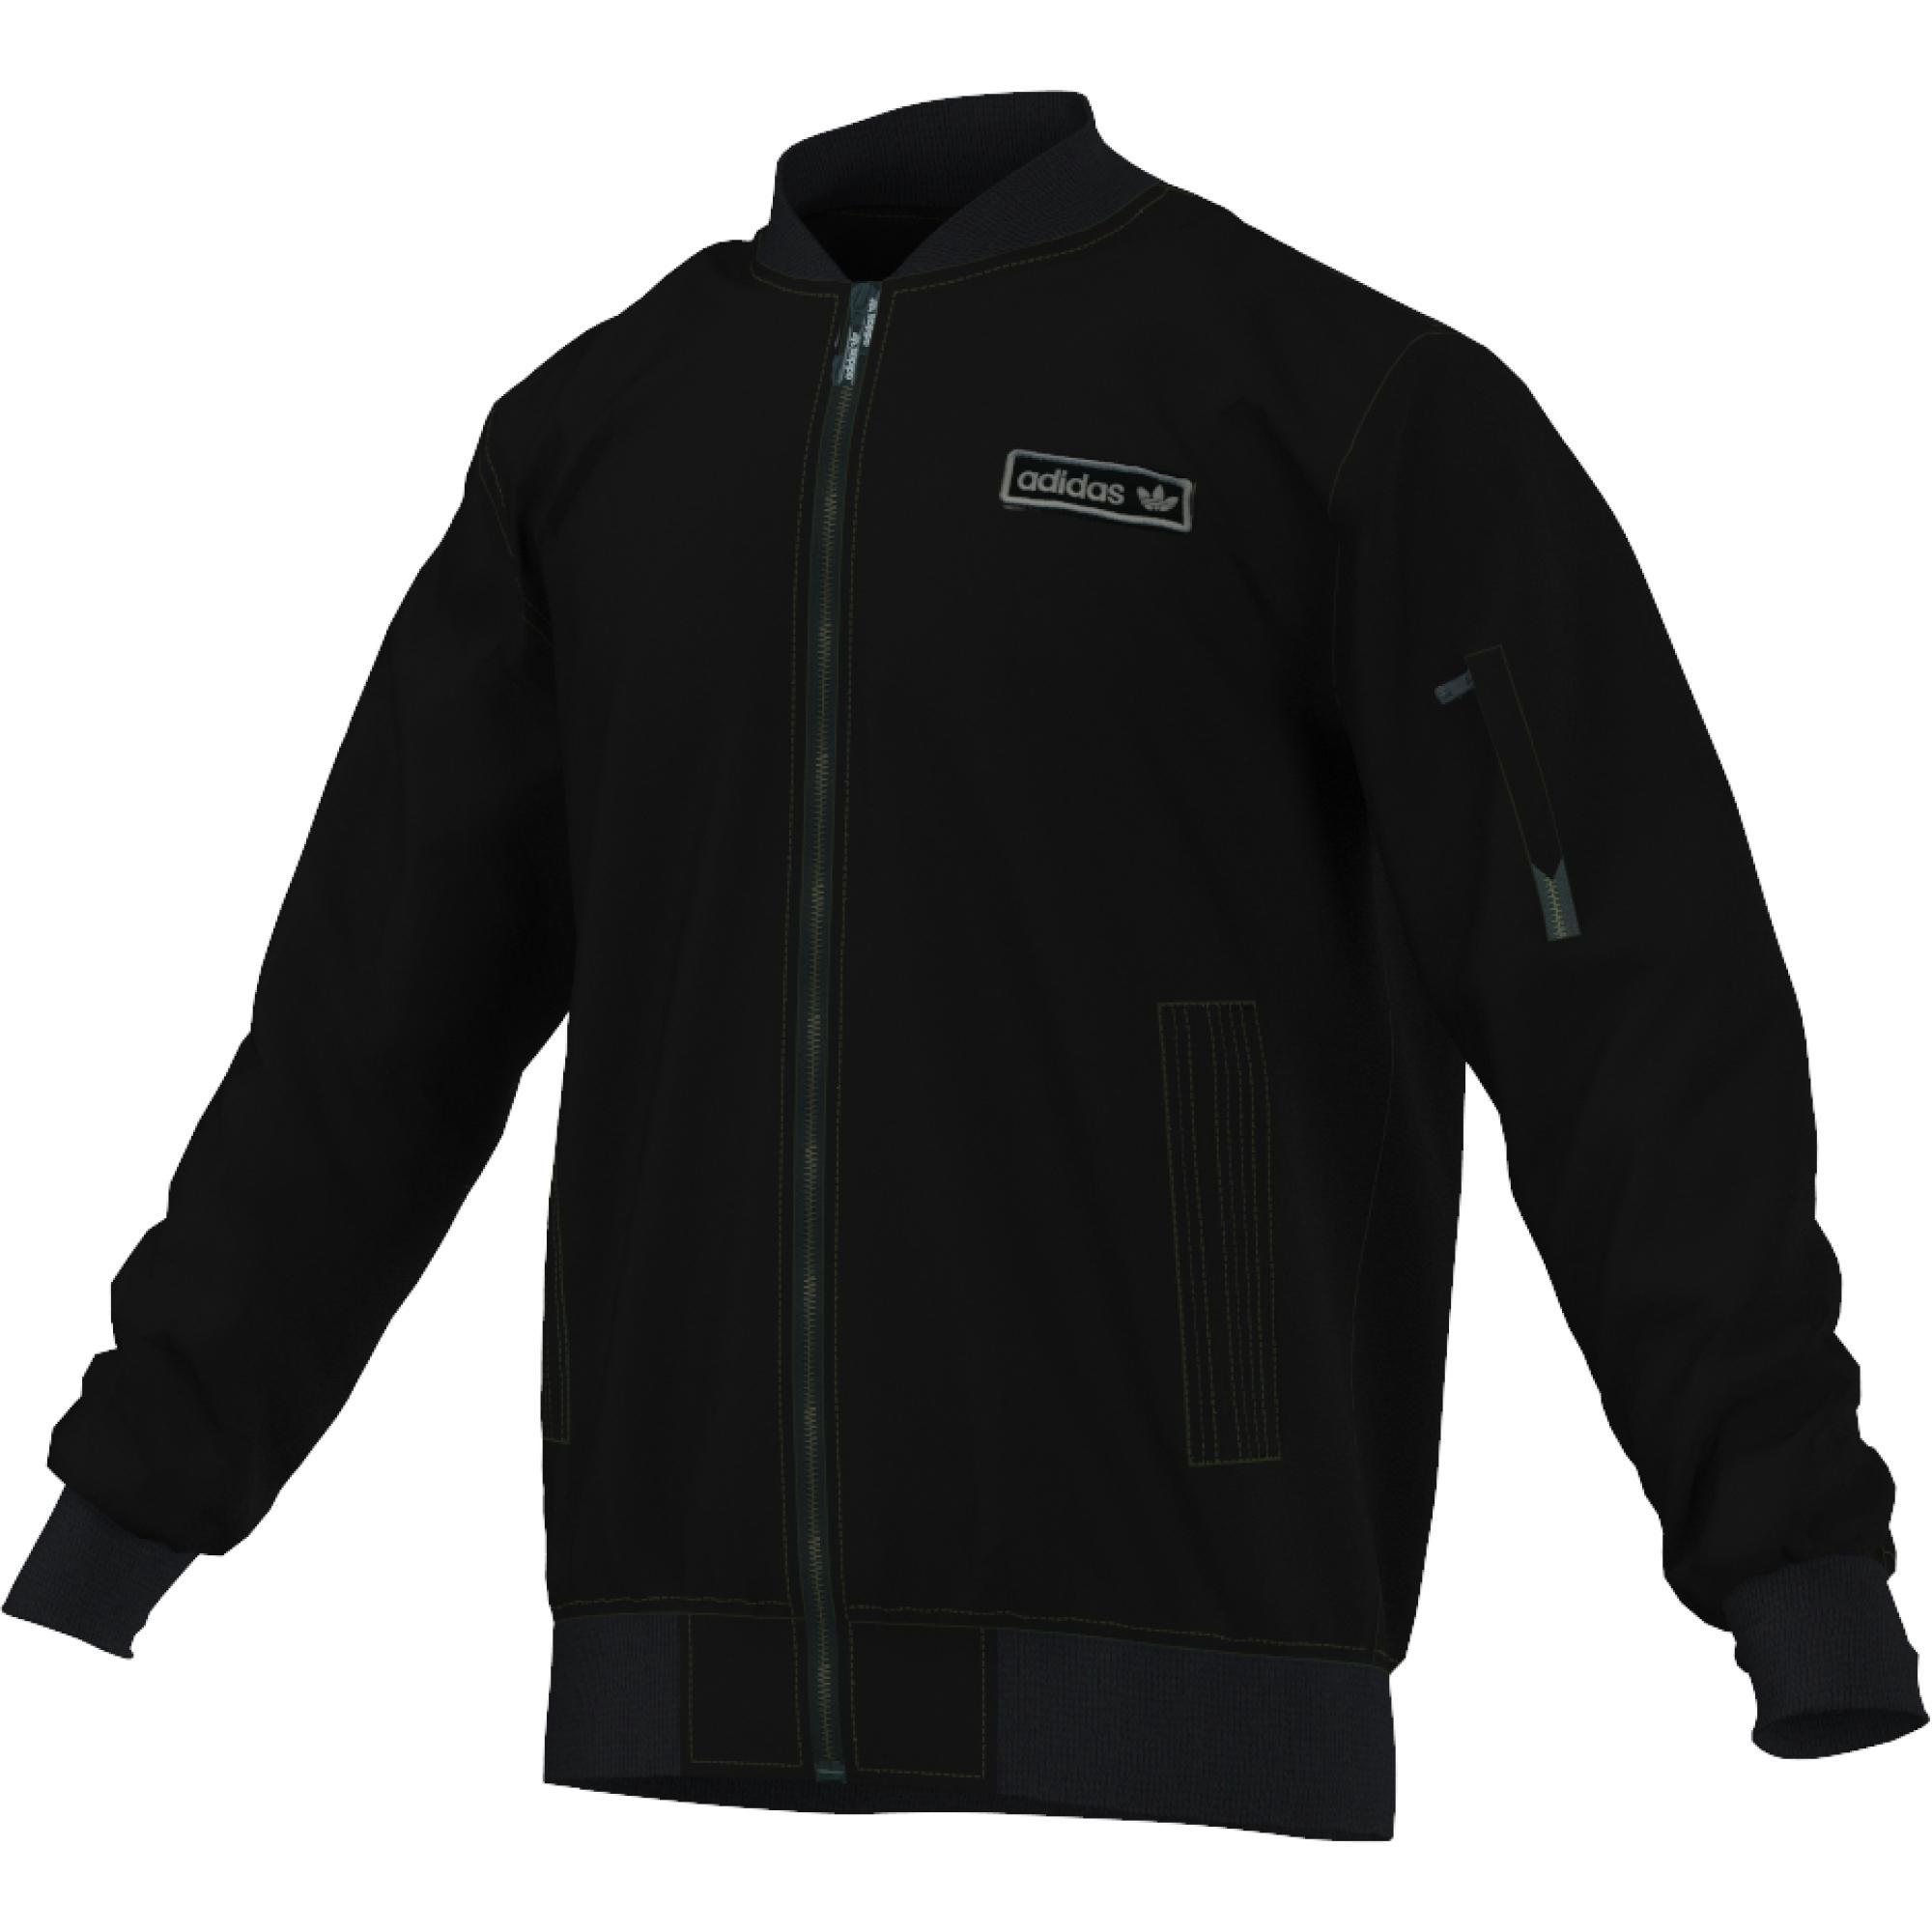 7ef4ad686d Adidas jacket , Férfi ruházat   kabát   adidas_originals   Adidas jacket